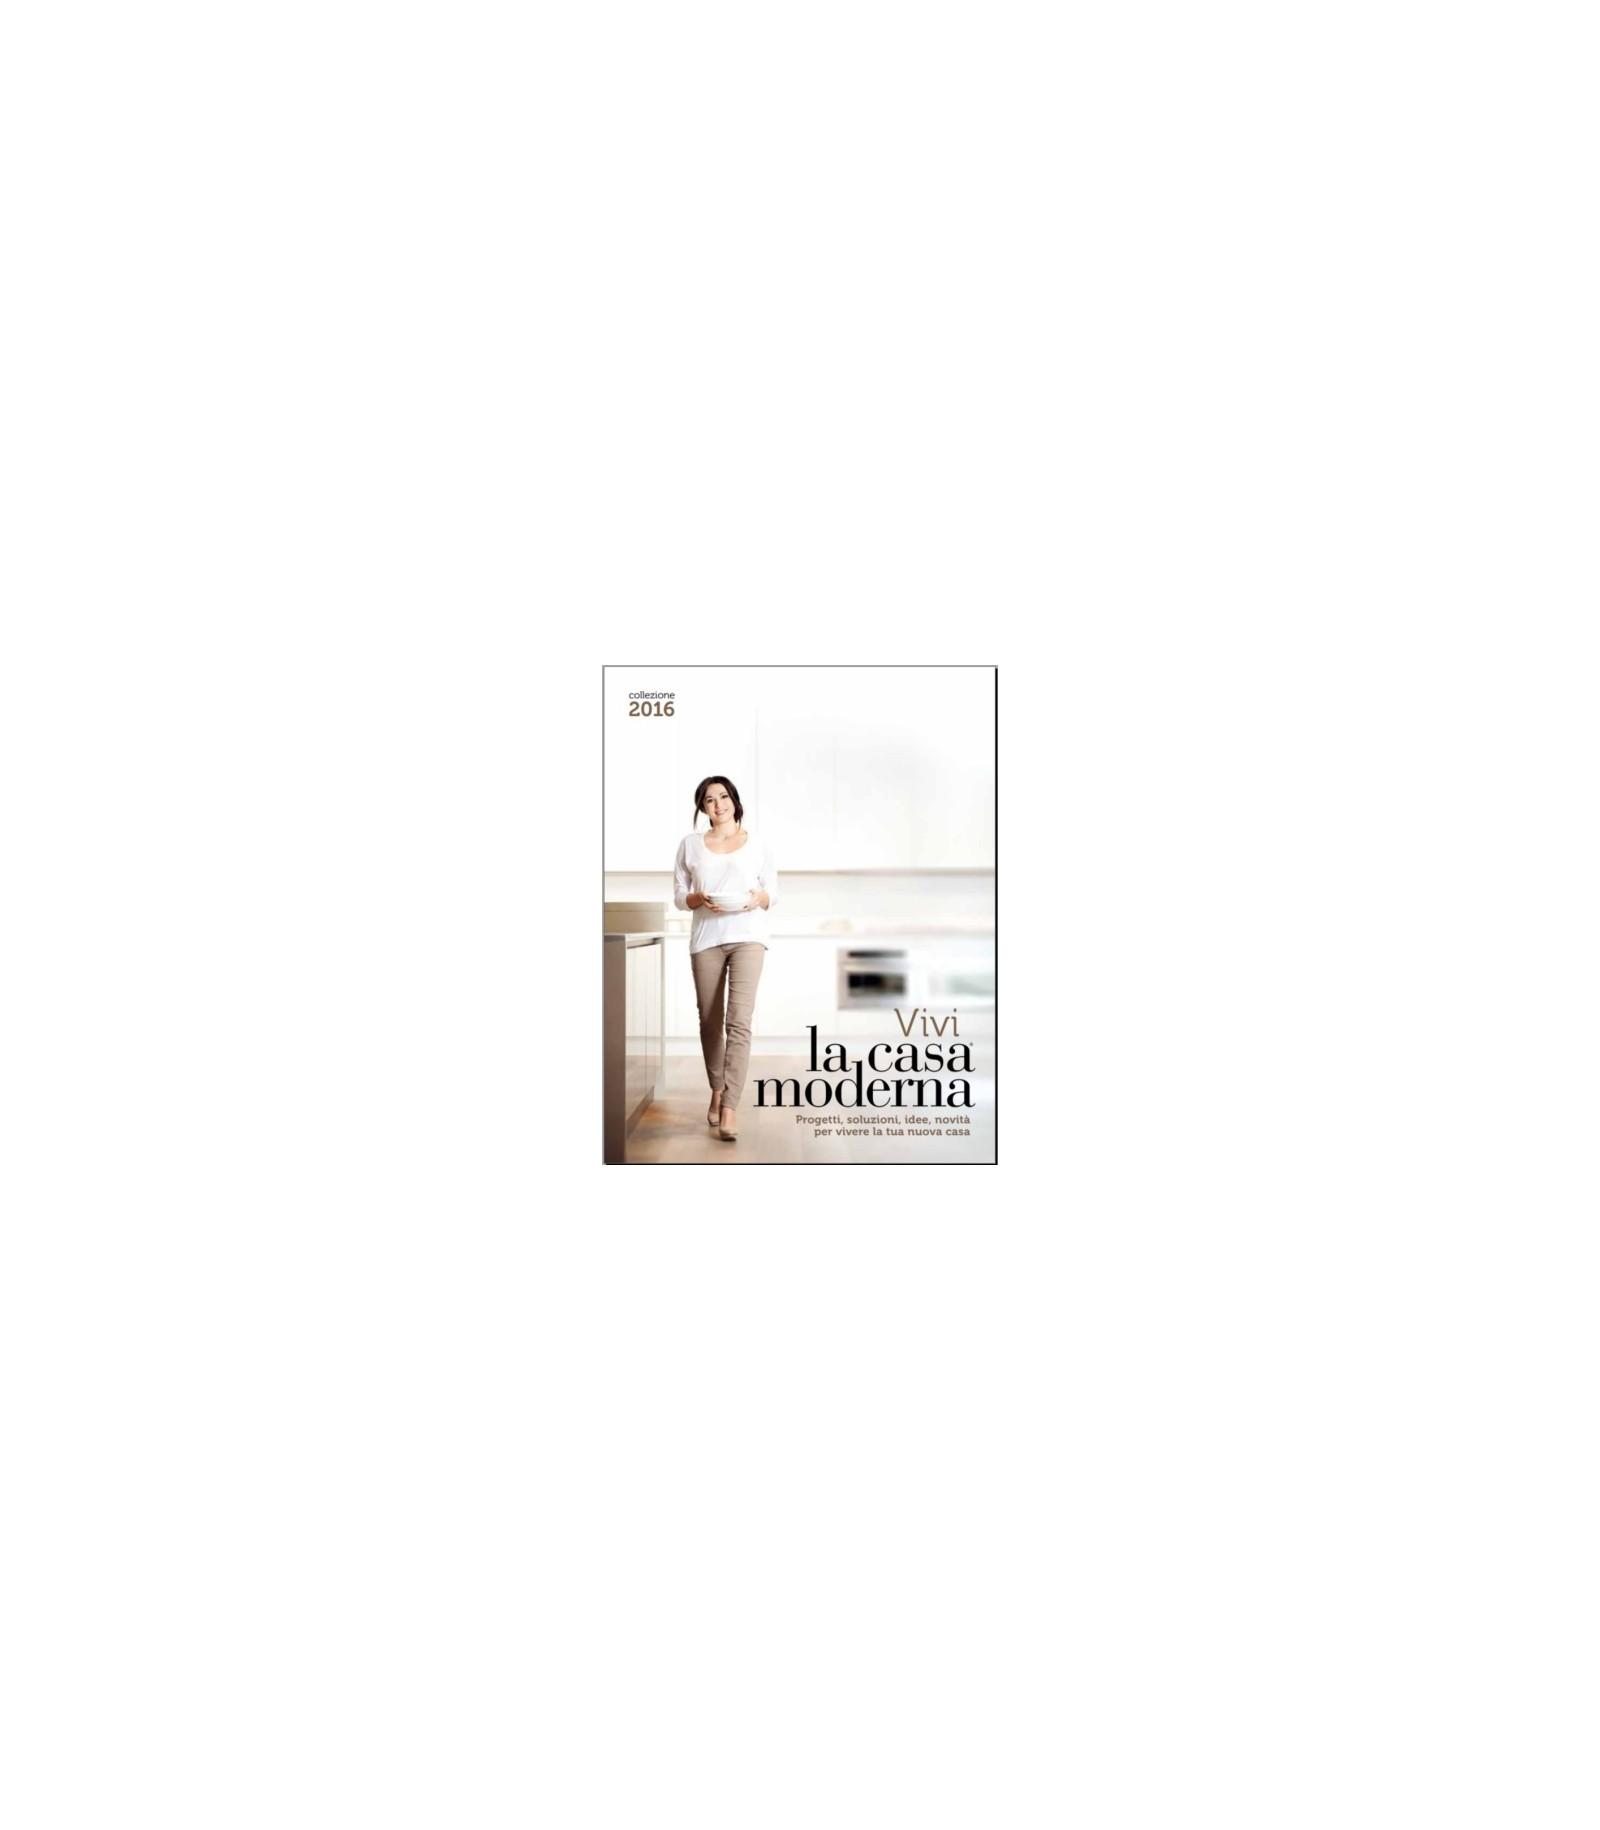 La casa moderna catalogo 2016 for Moderna catalogo